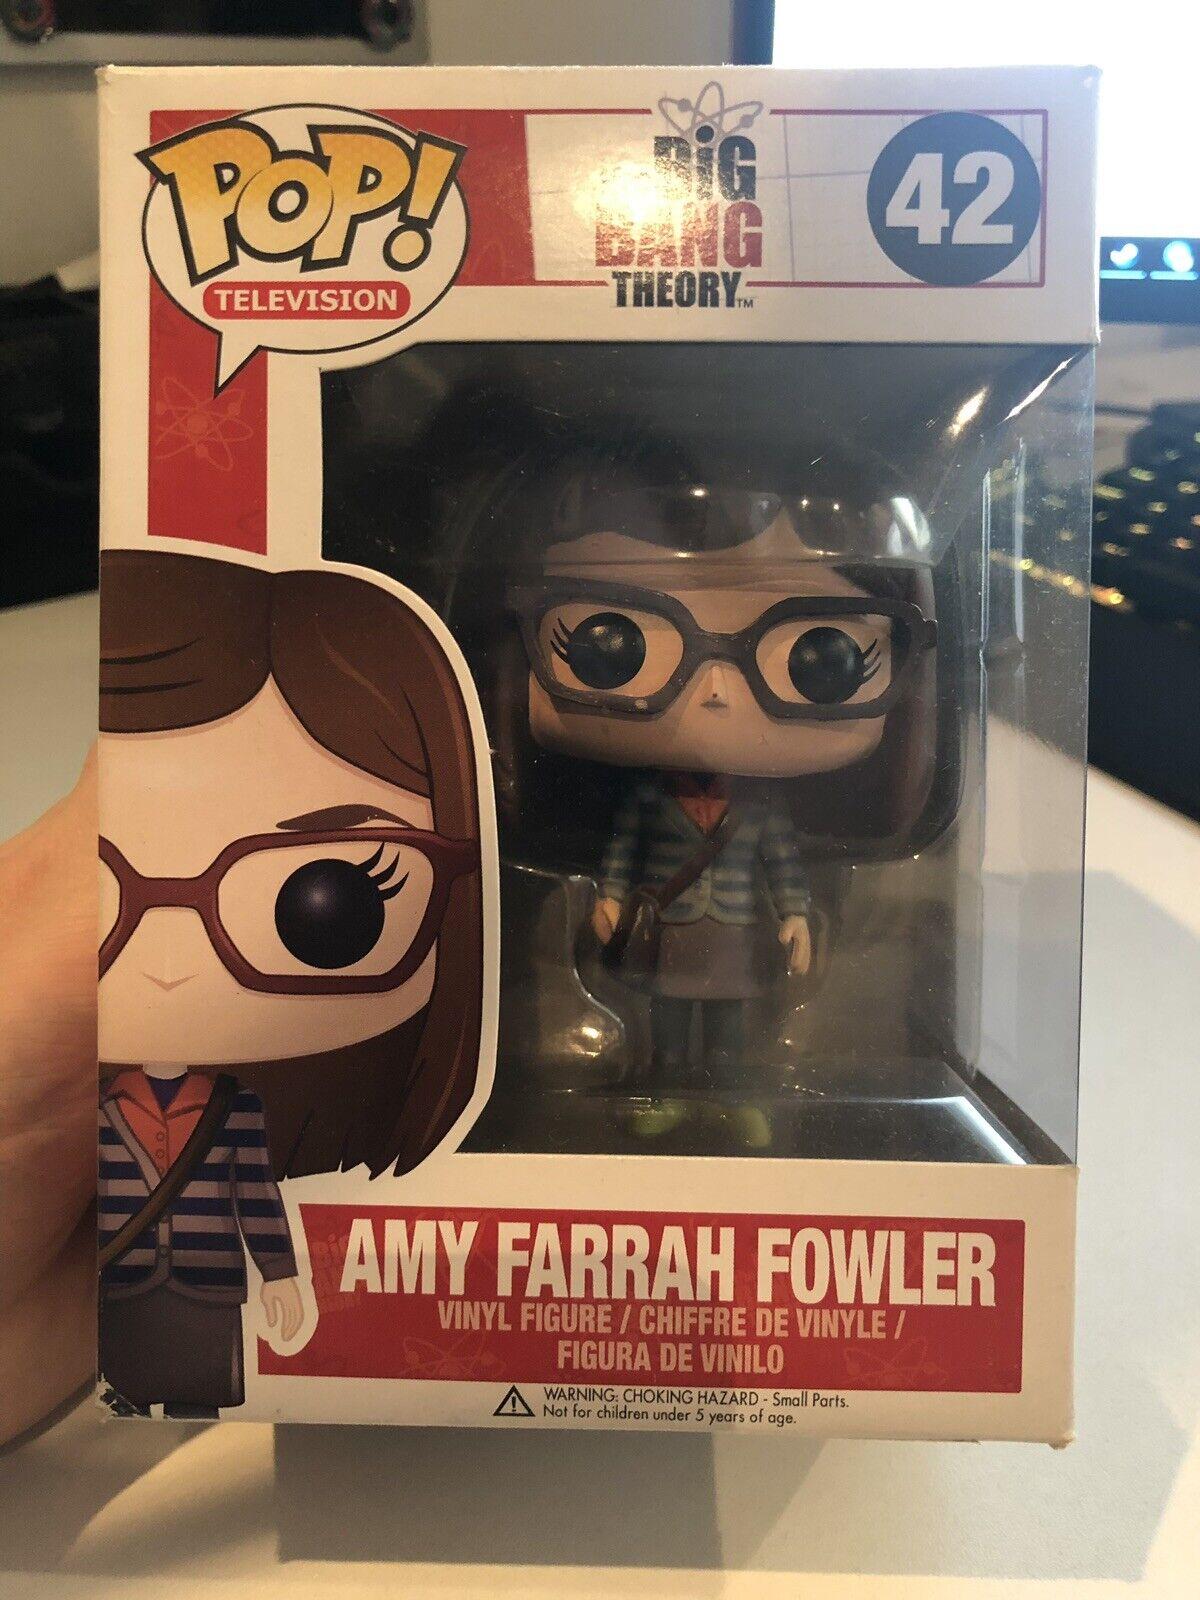 Diverdeimentoko Pop Il gree Bang teoria AMY FARRAH Fowler   vendita online